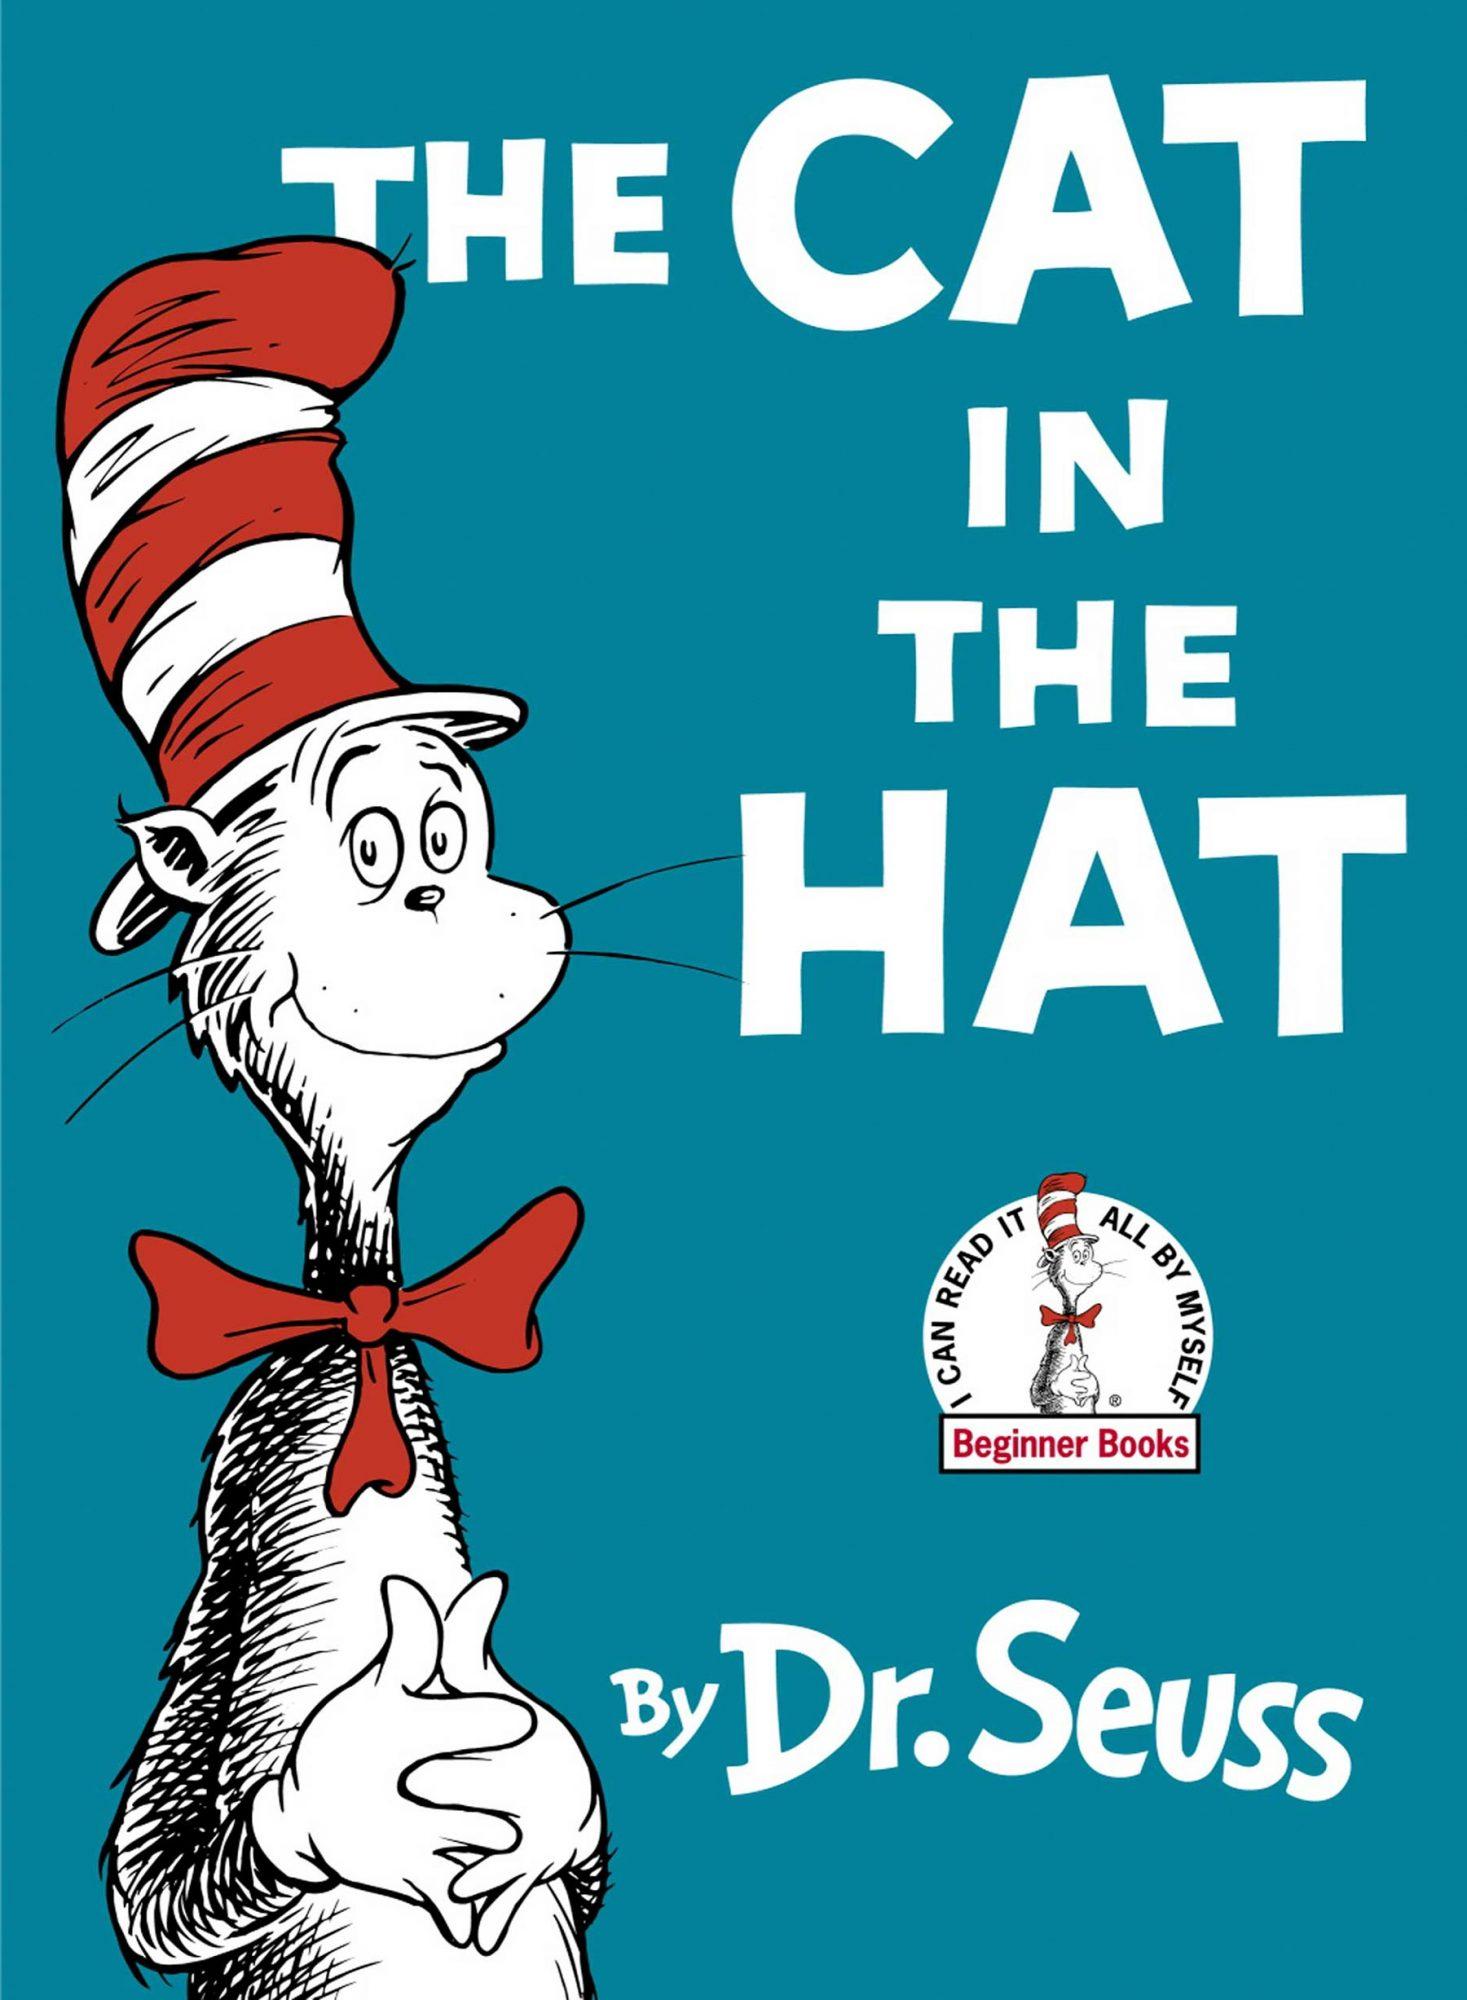 The Cat in the Hat Dr. Seuss Bookcover CR: Random House Children's Books